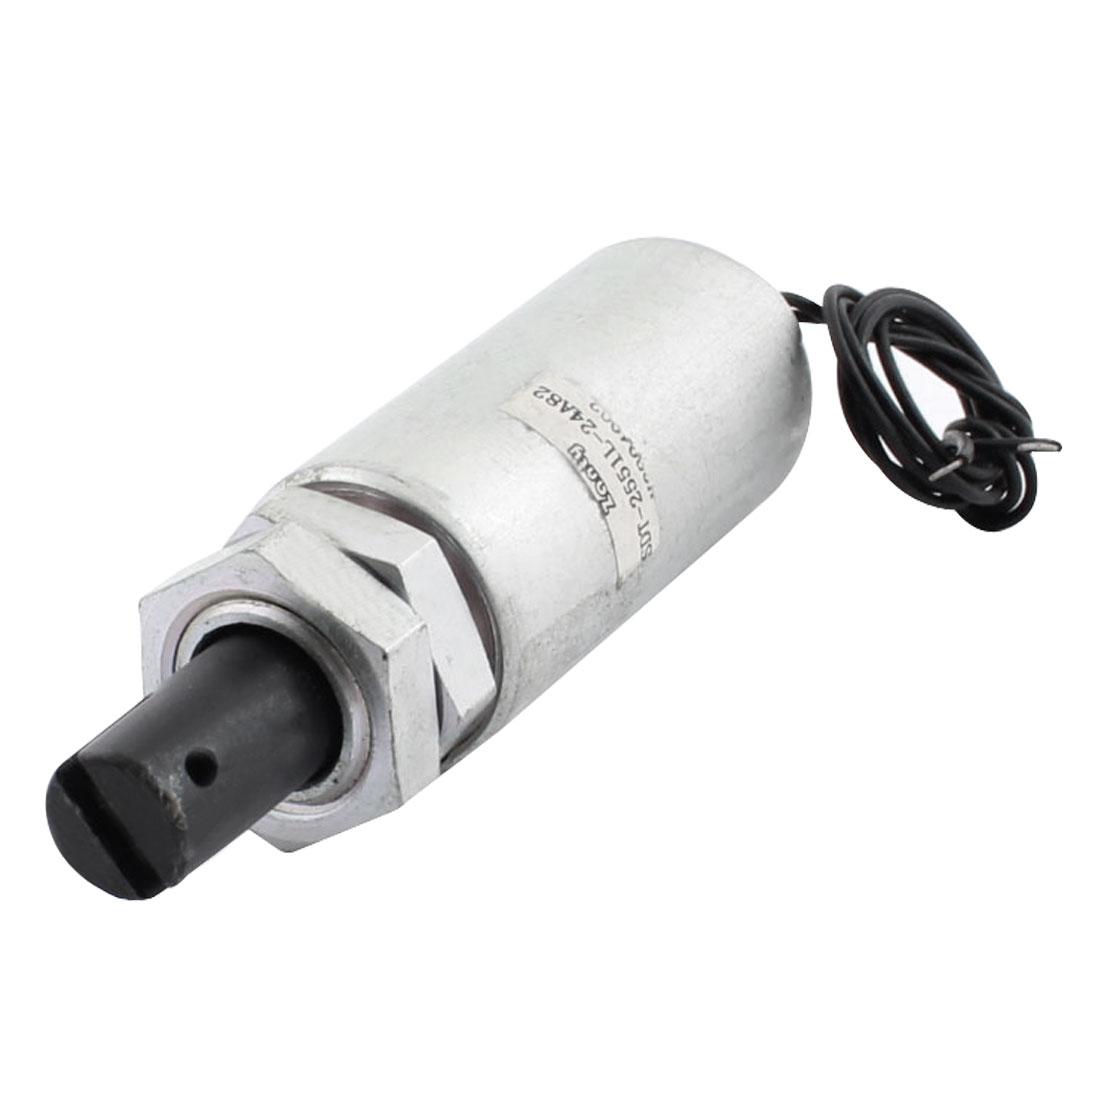 Metal Shell DC 24V 500g/50mm Pull Electric Magnet Electromagnet Solenoid